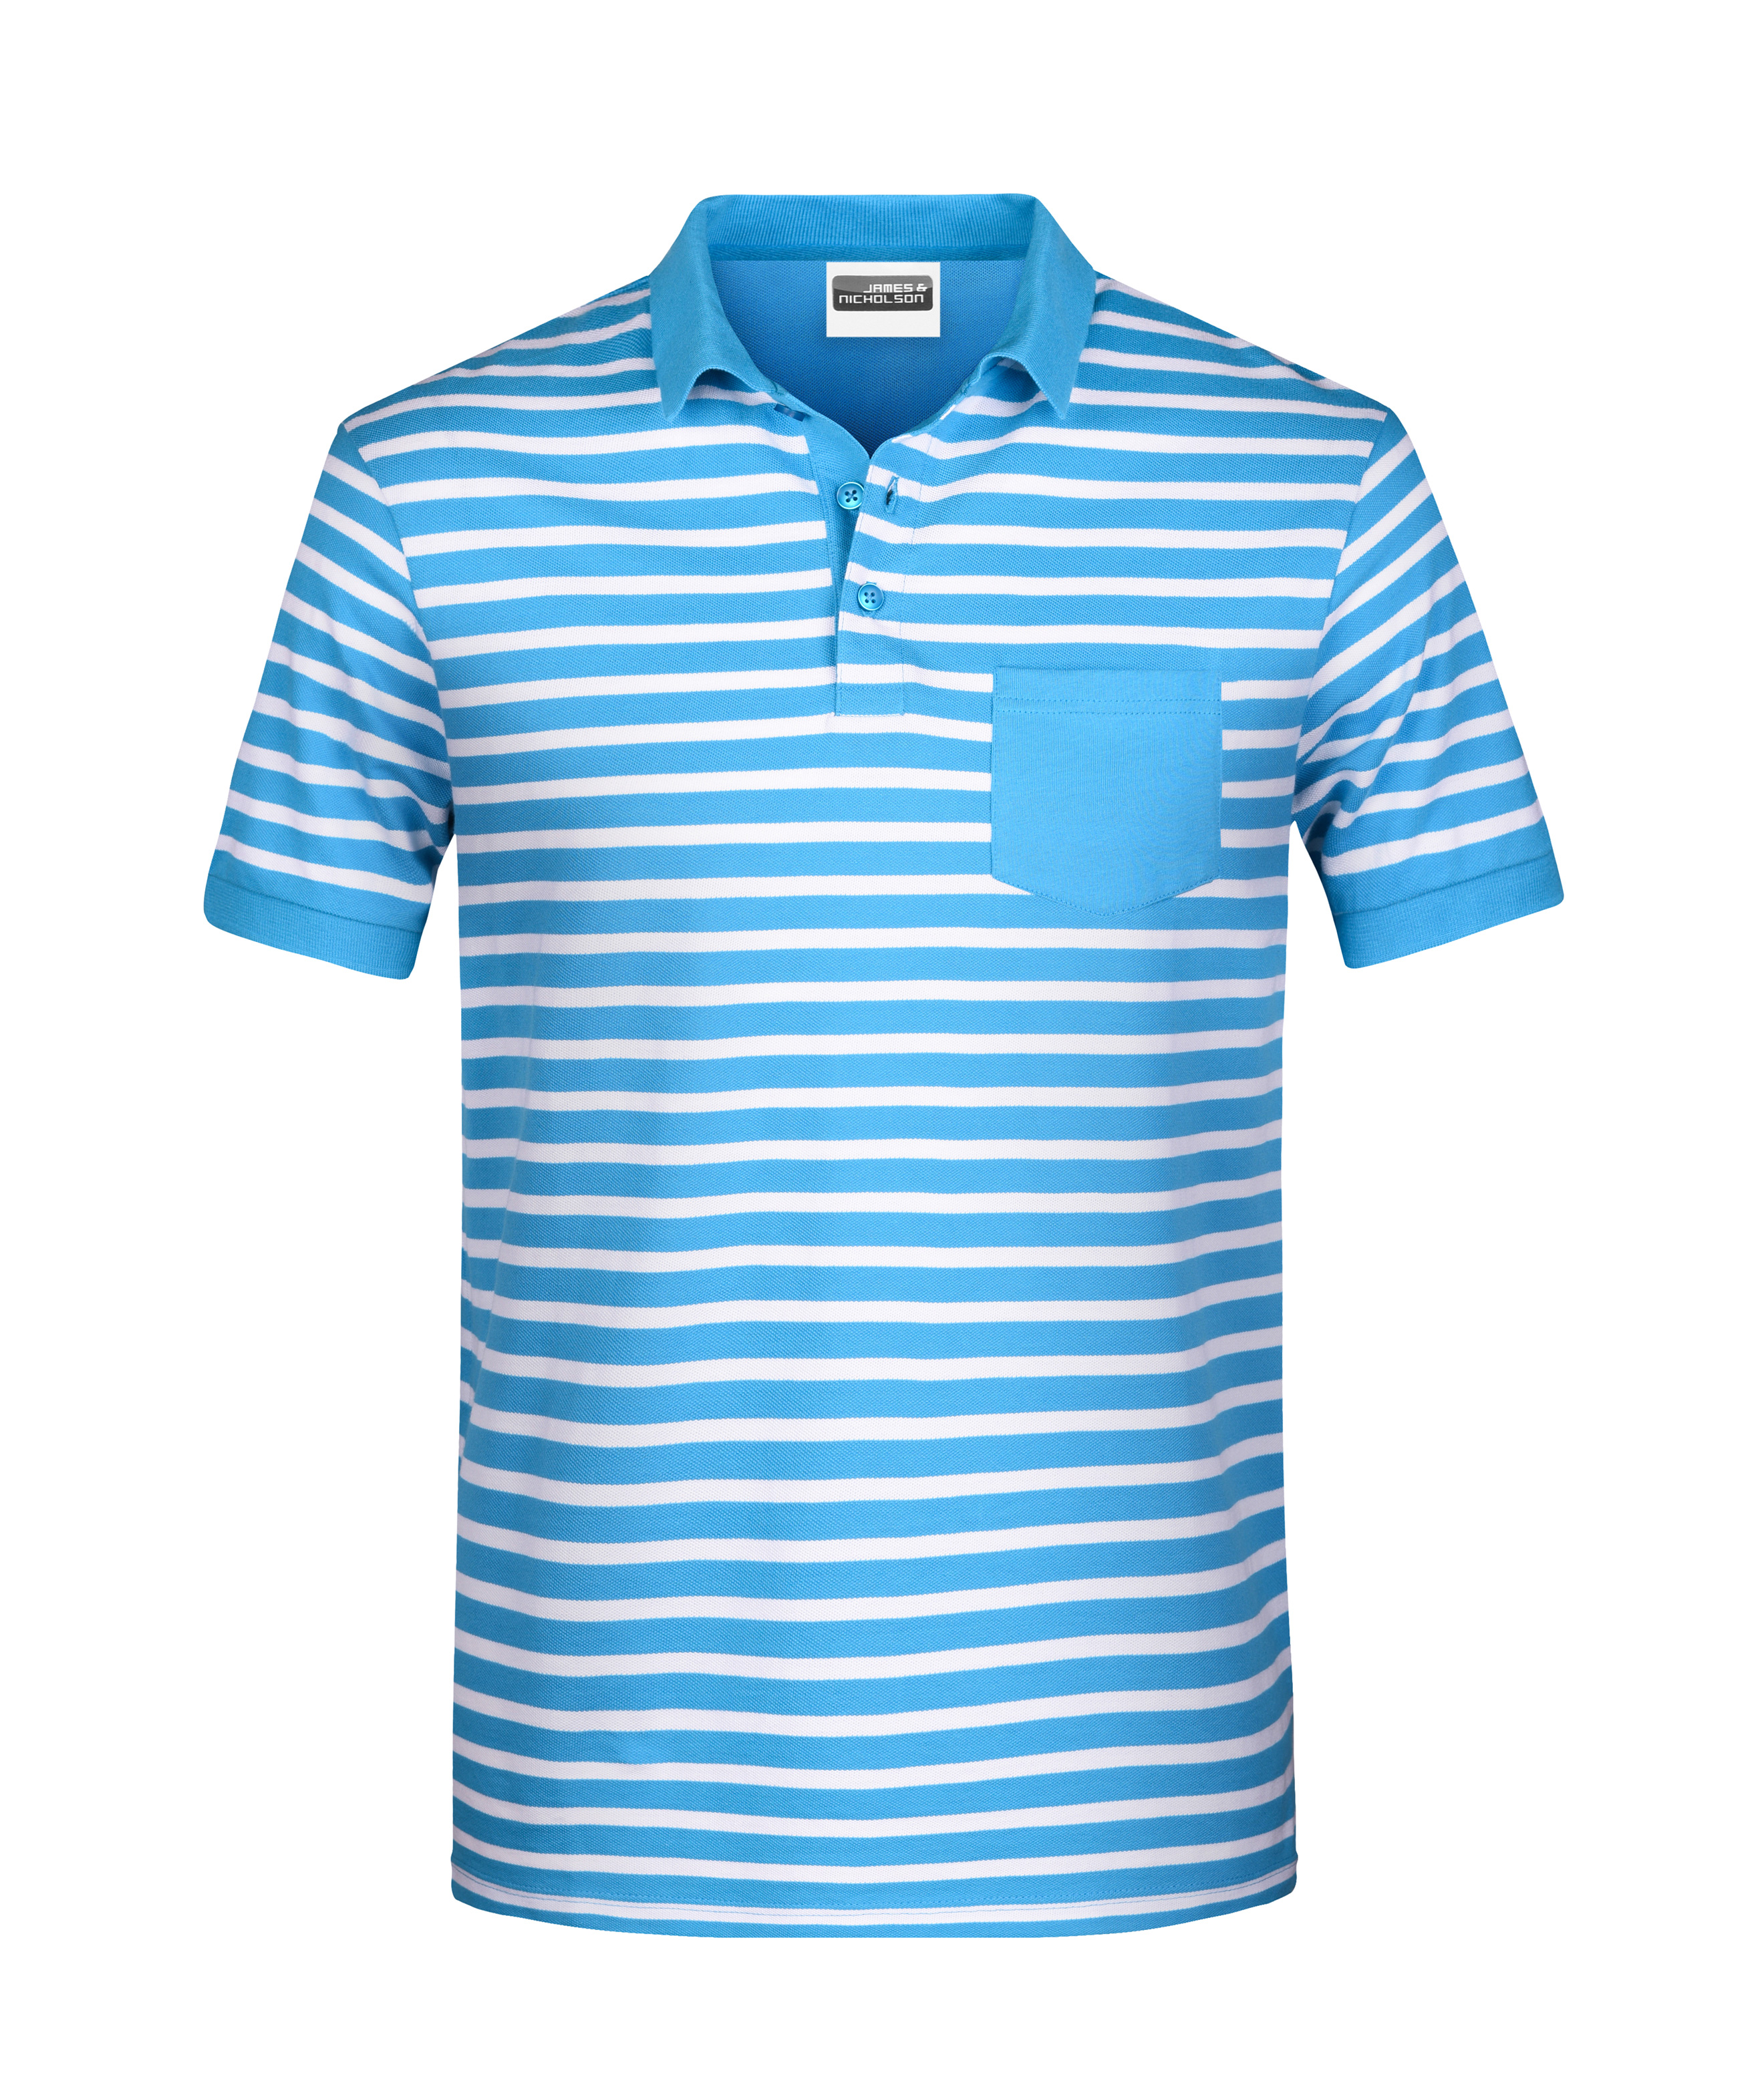 7c21a239db8f4b Polo-Shirts